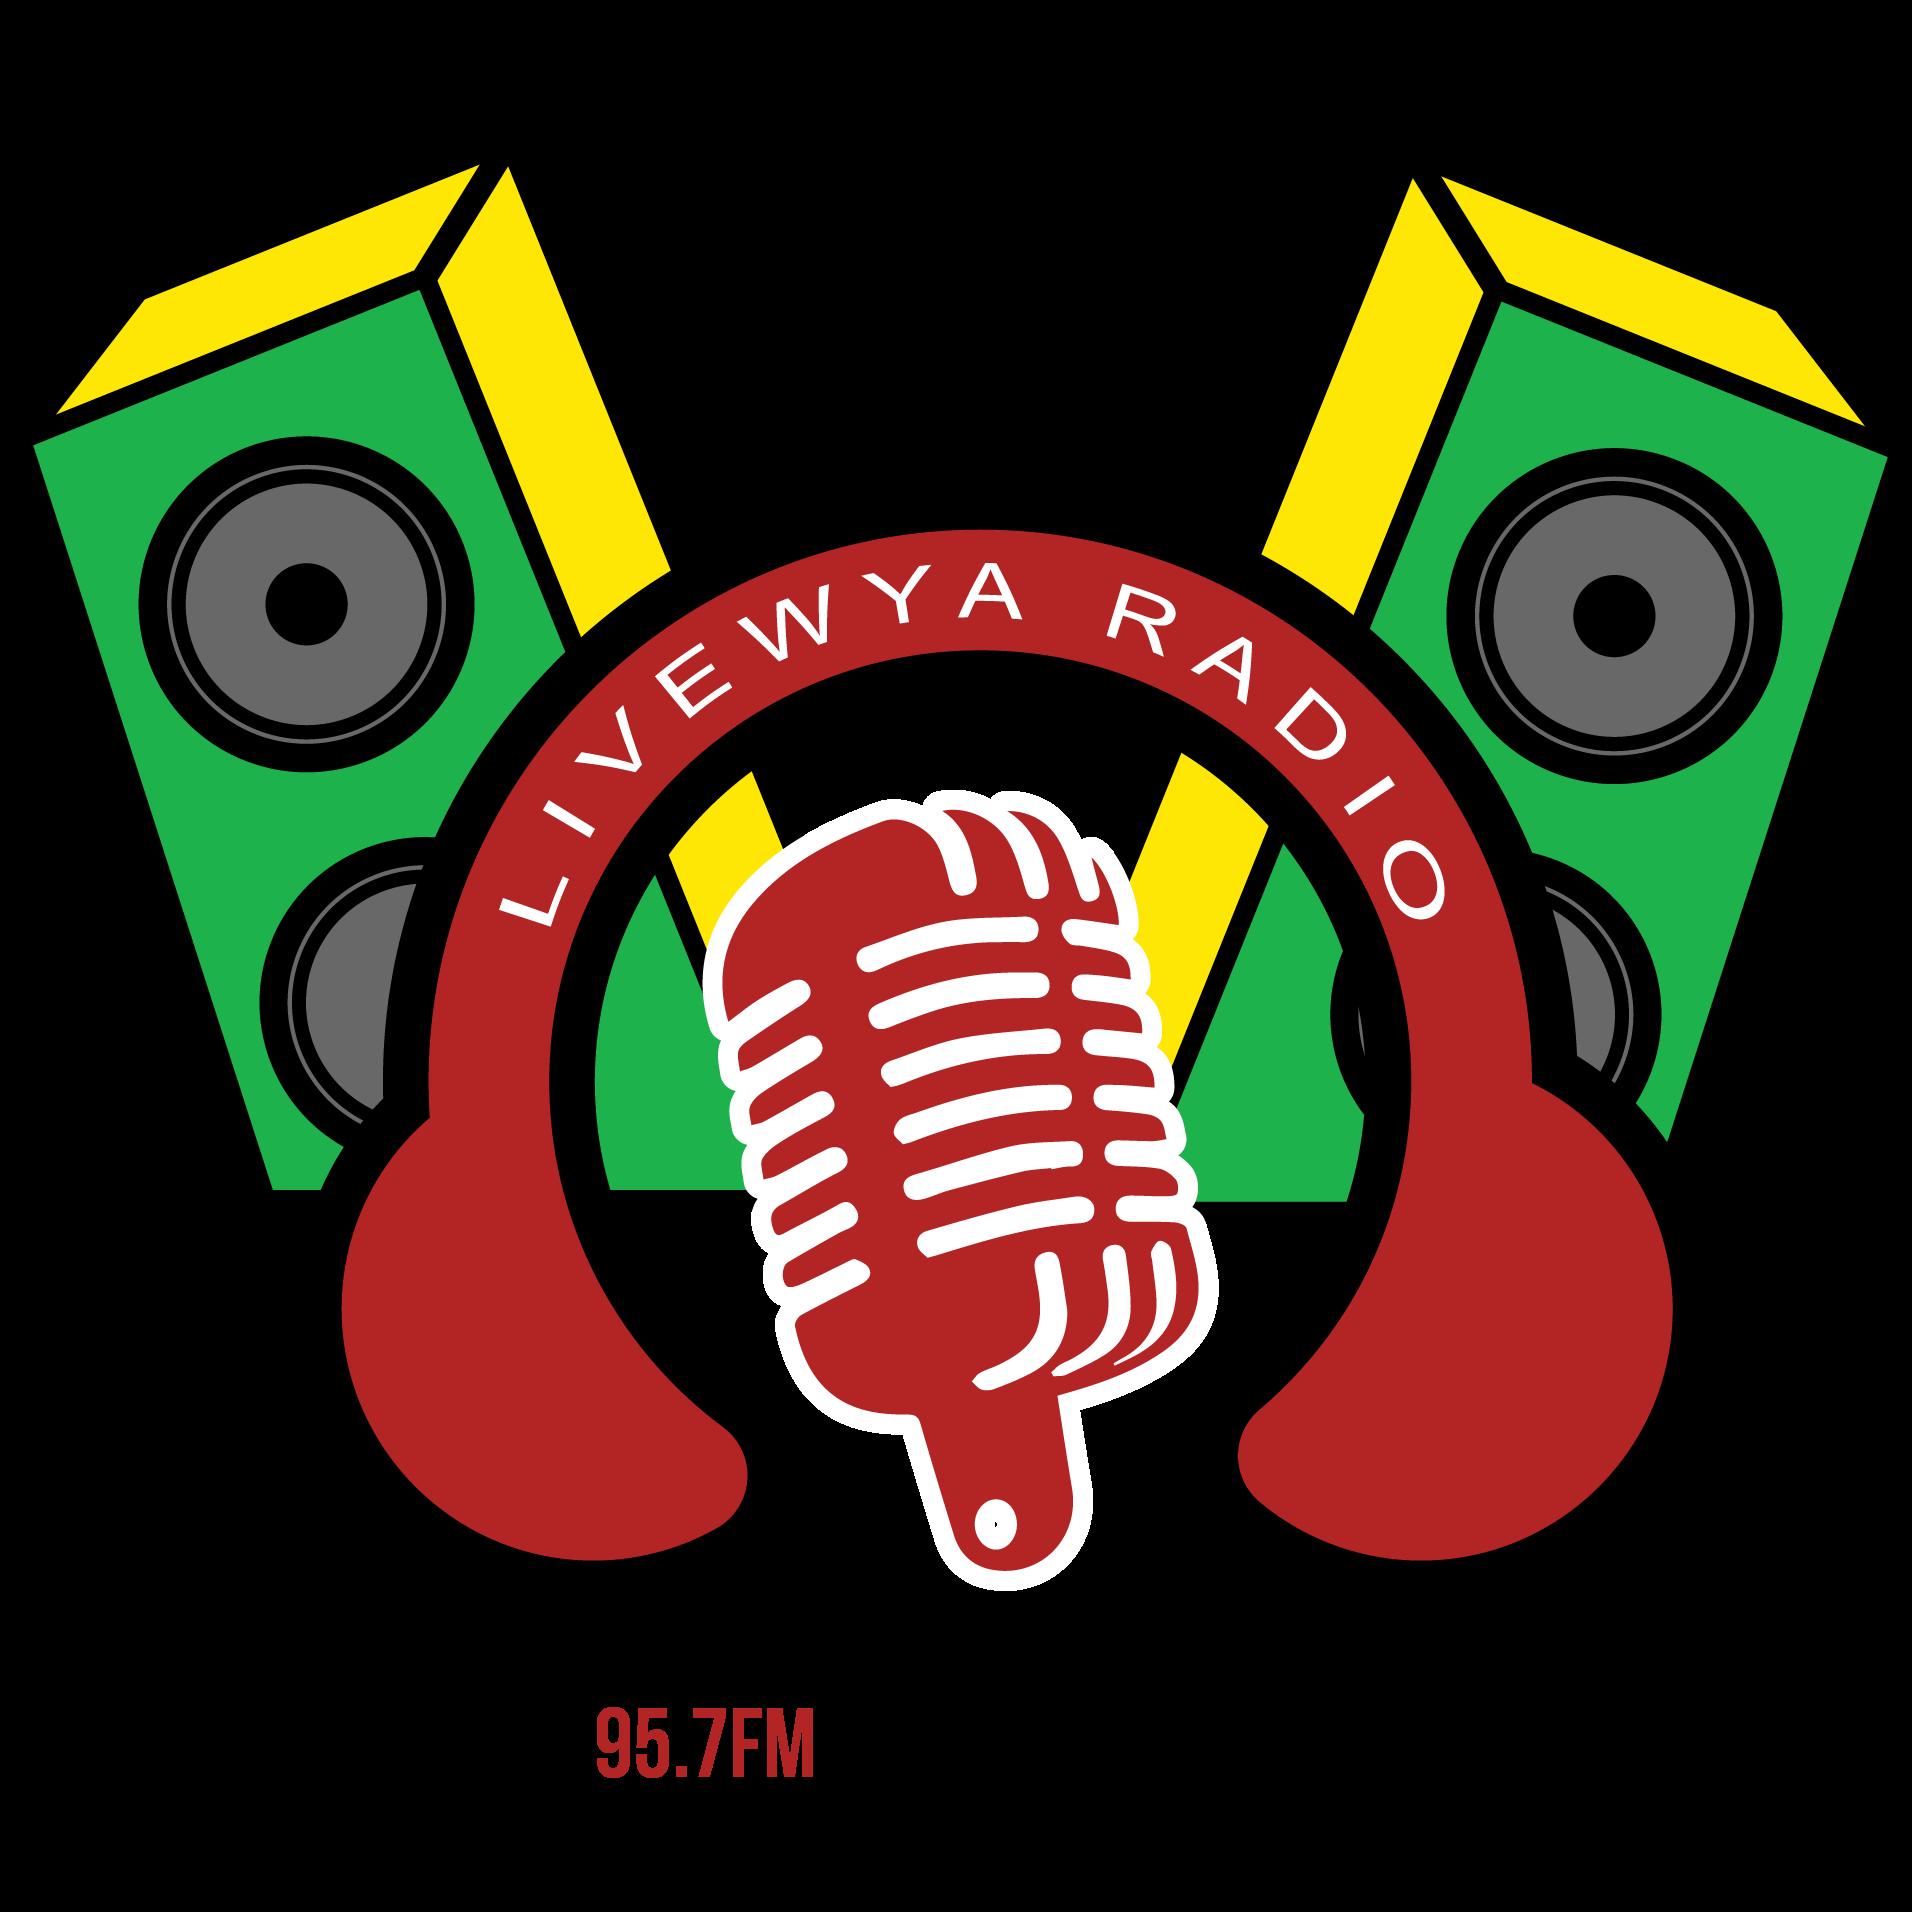 Livewya Radio